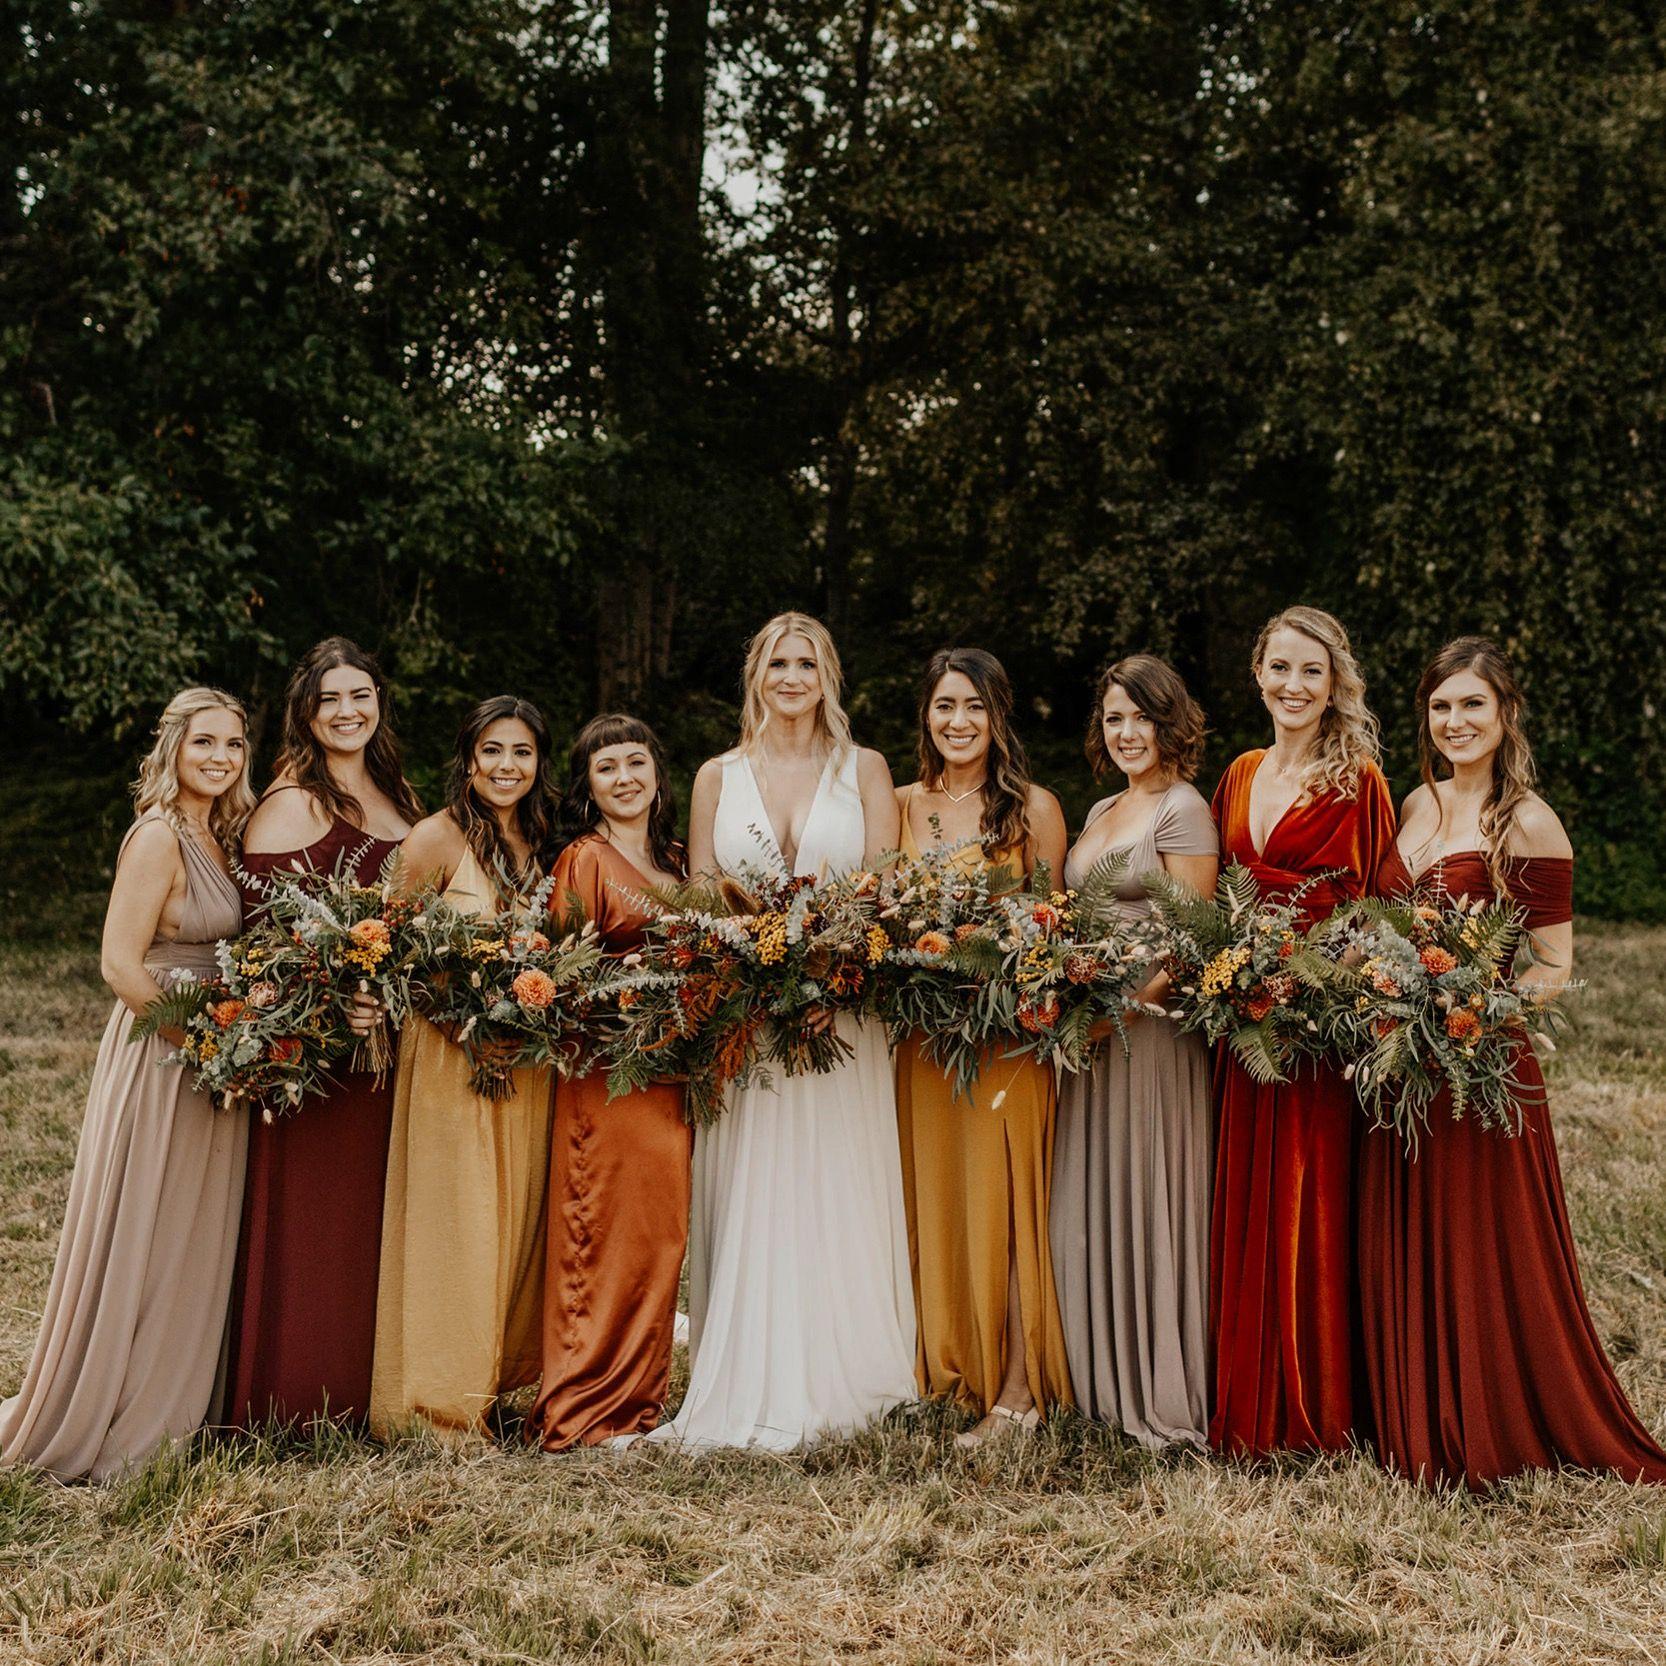 Vintage Sunset Bridesmaids Dresses Fall Bridesmaid Dress Colors Burnt Orange Bridesmaid Dresses Orange Bridesmaid Dresses [ 1666 x 1666 Pixel ]